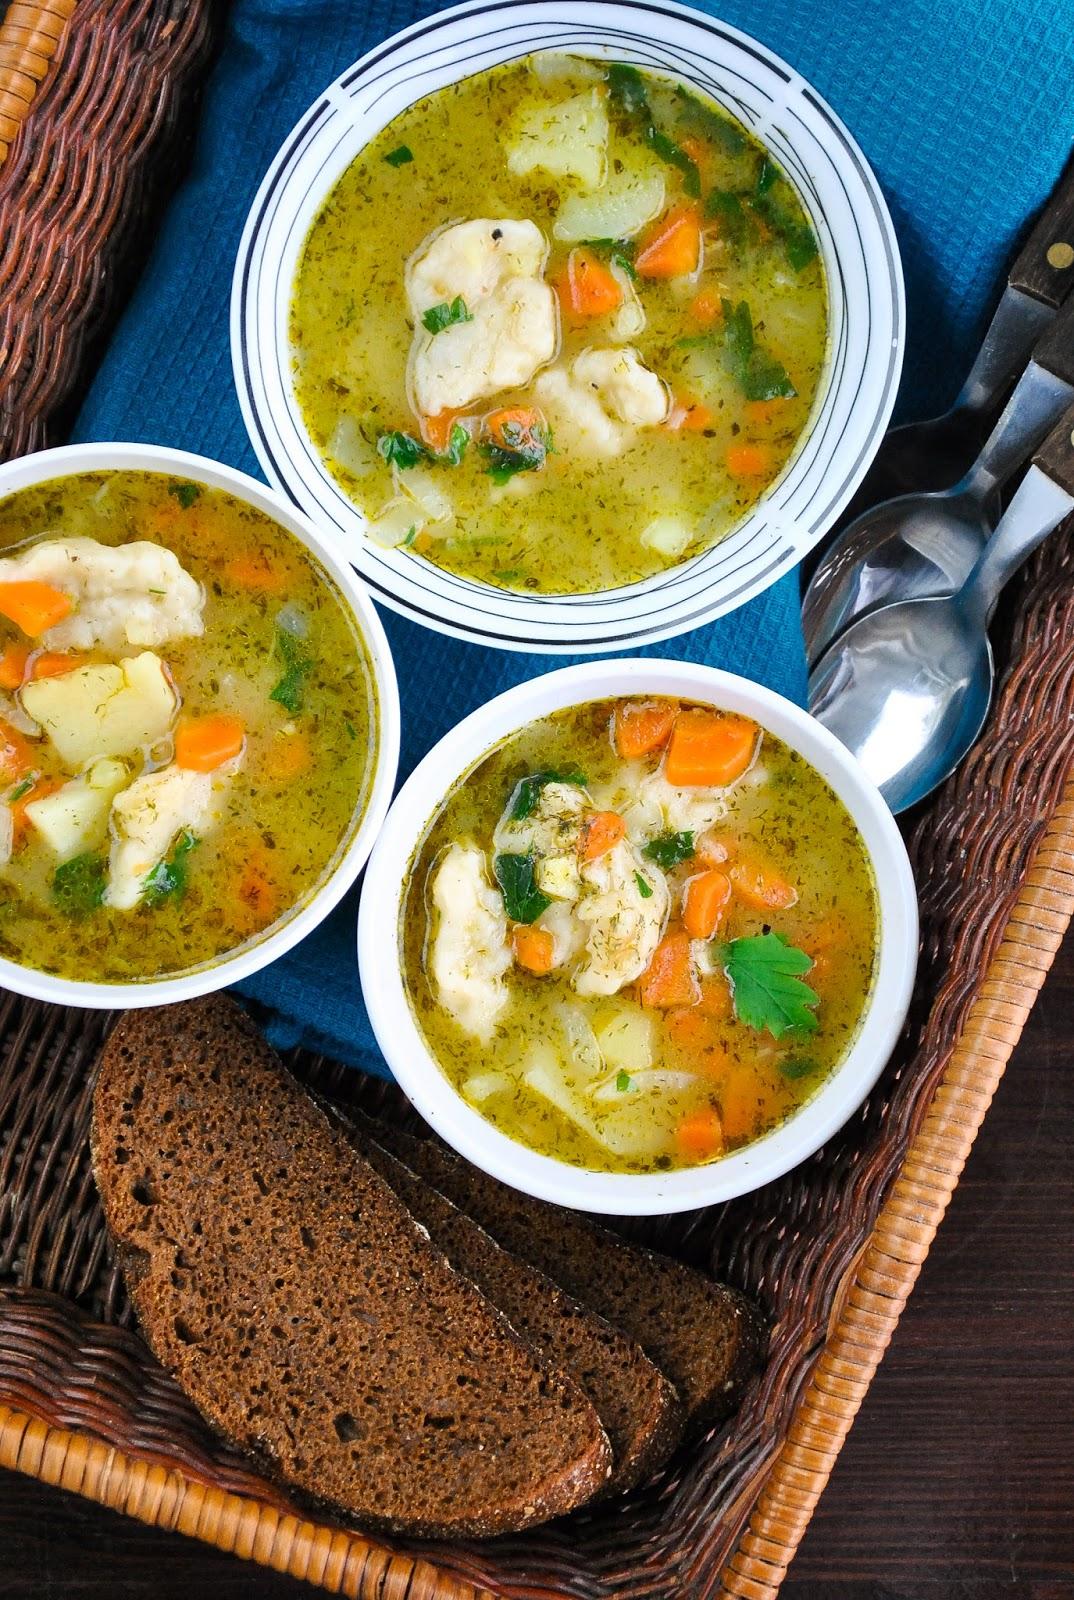 Vegetable and dumpling soup 2